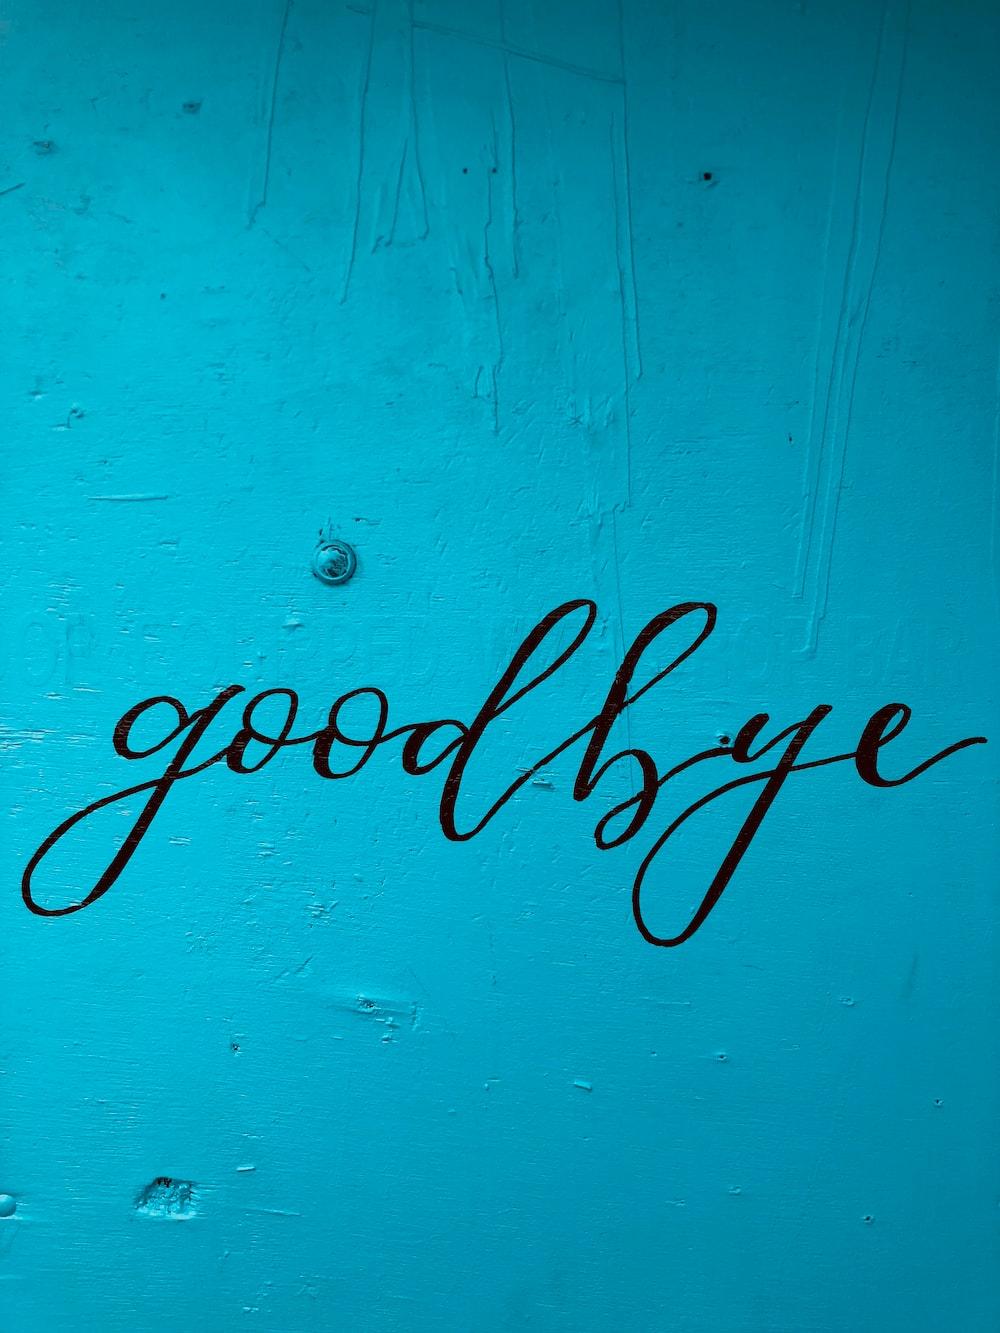 Goodbye print on the wall